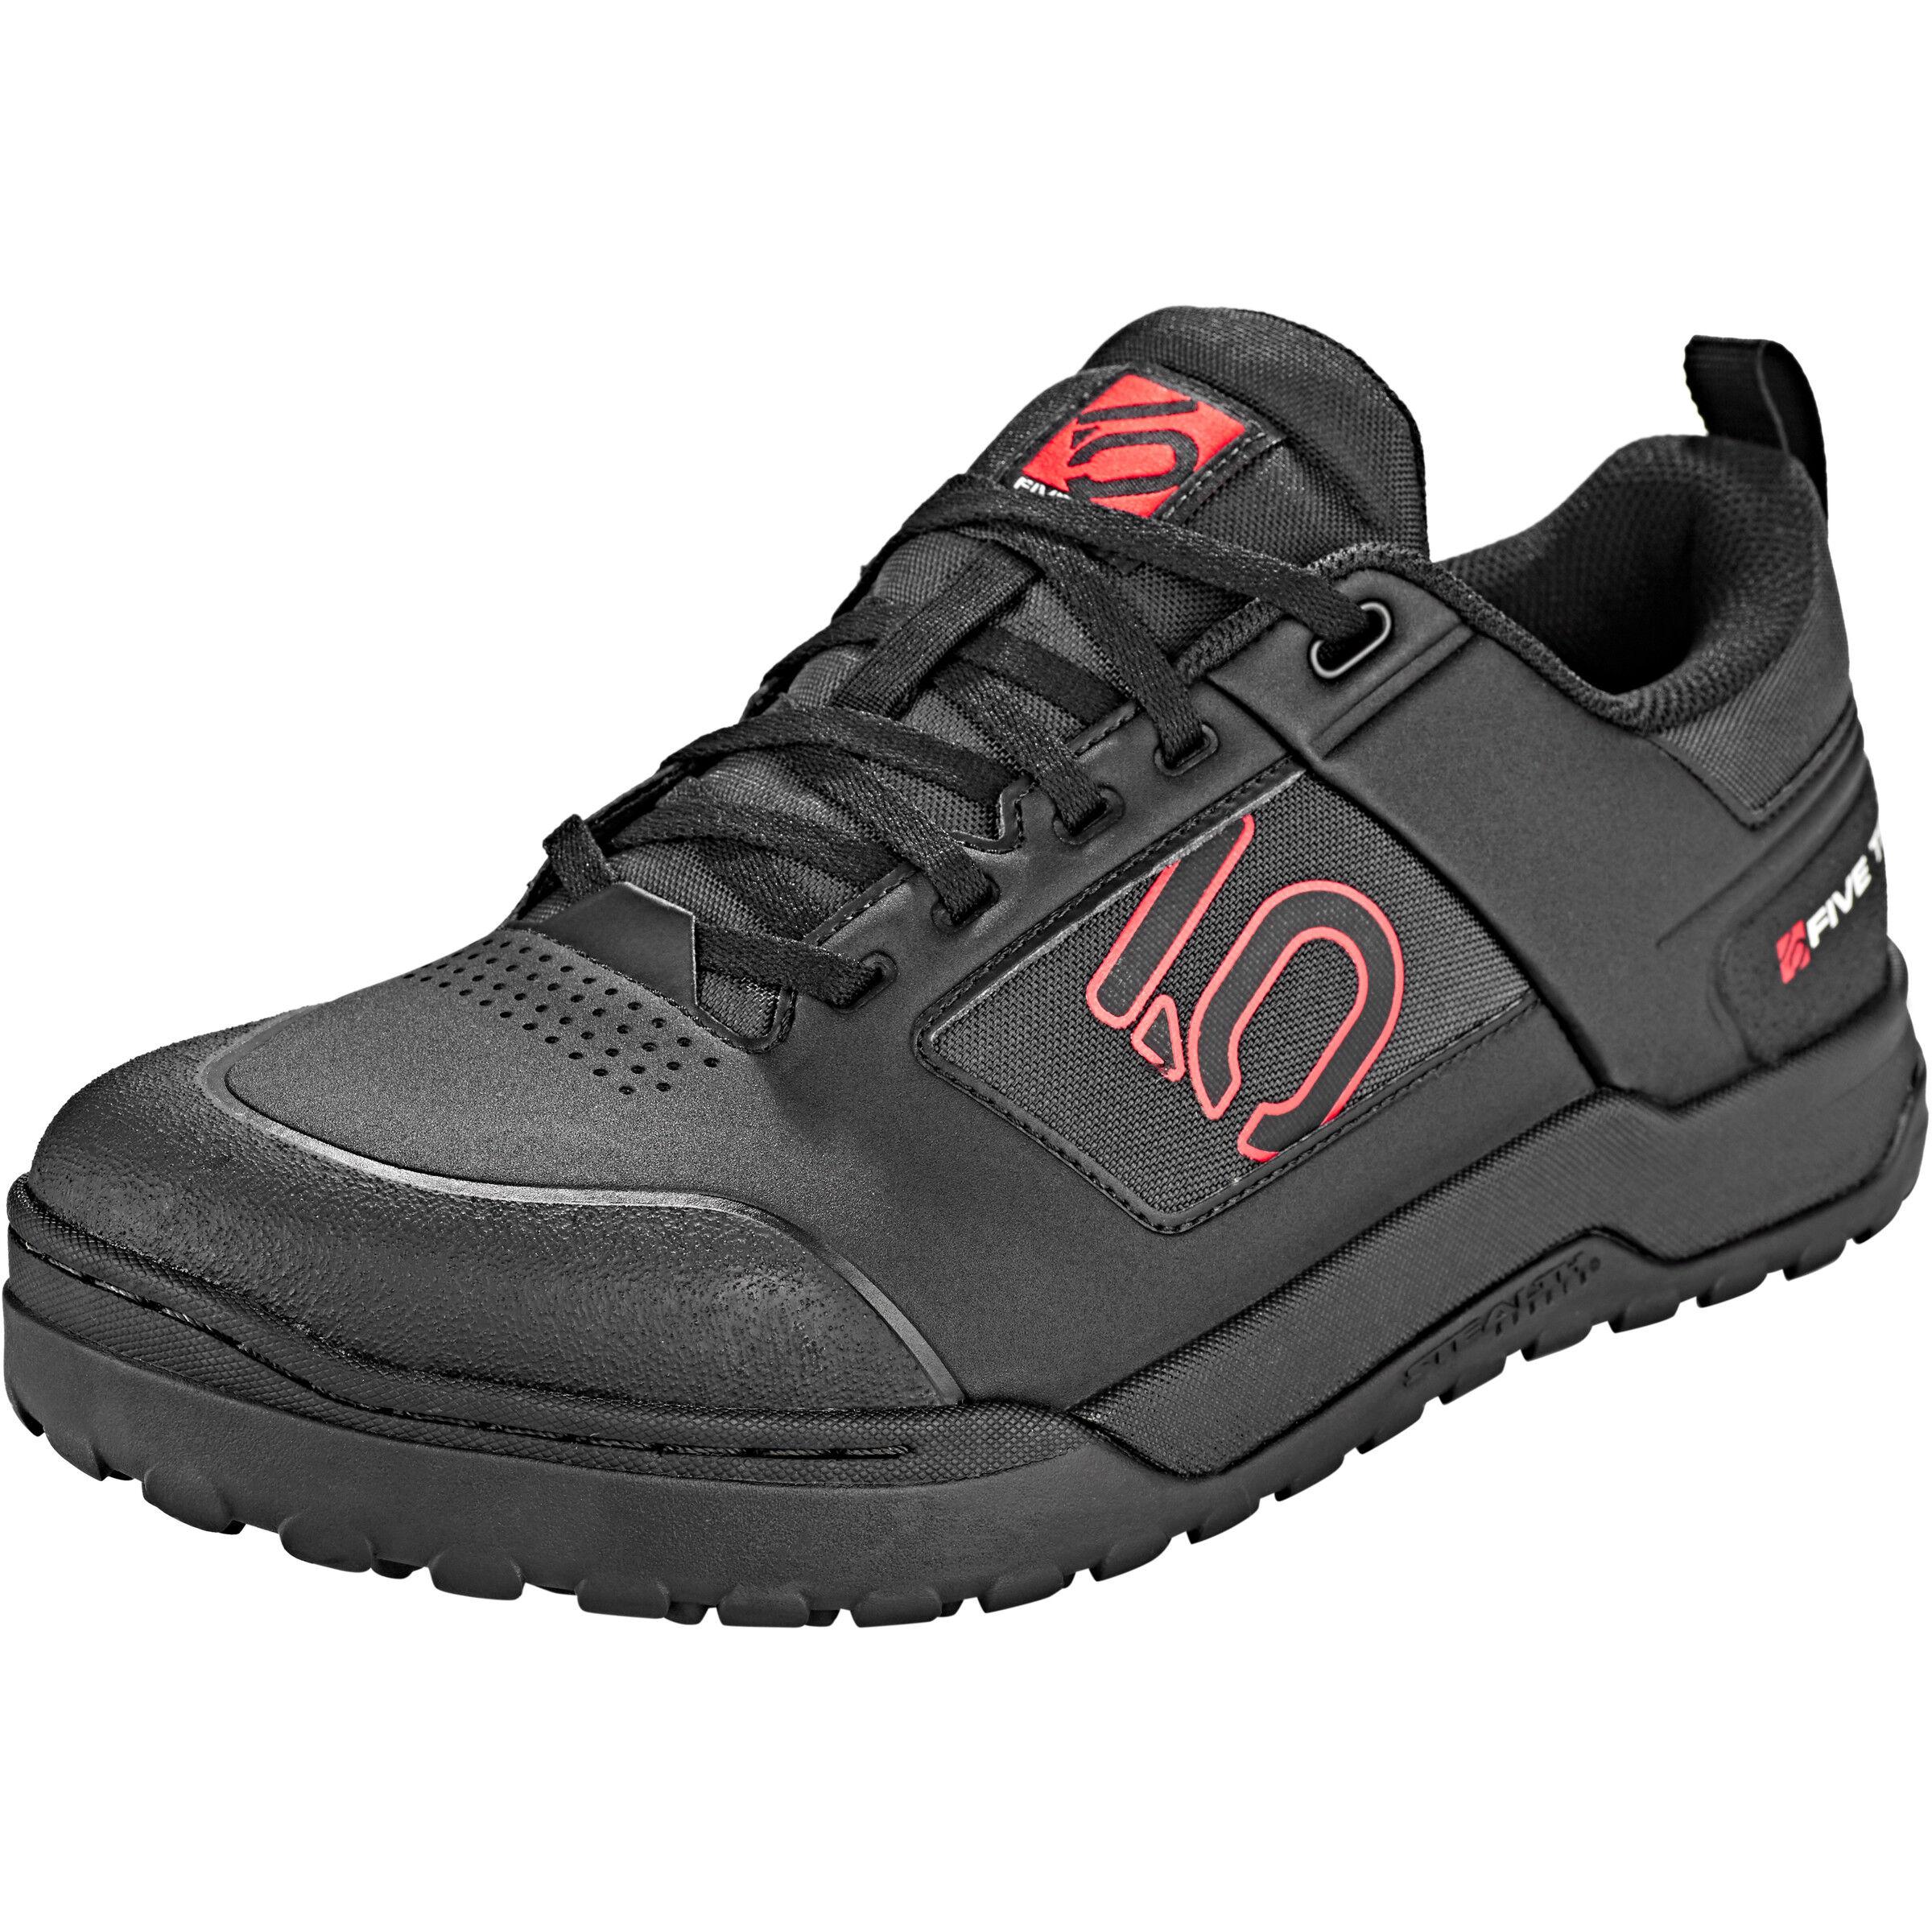 Kaufen Günstig Mtb Five Ten Adidas Schuhe vNm8wn0O